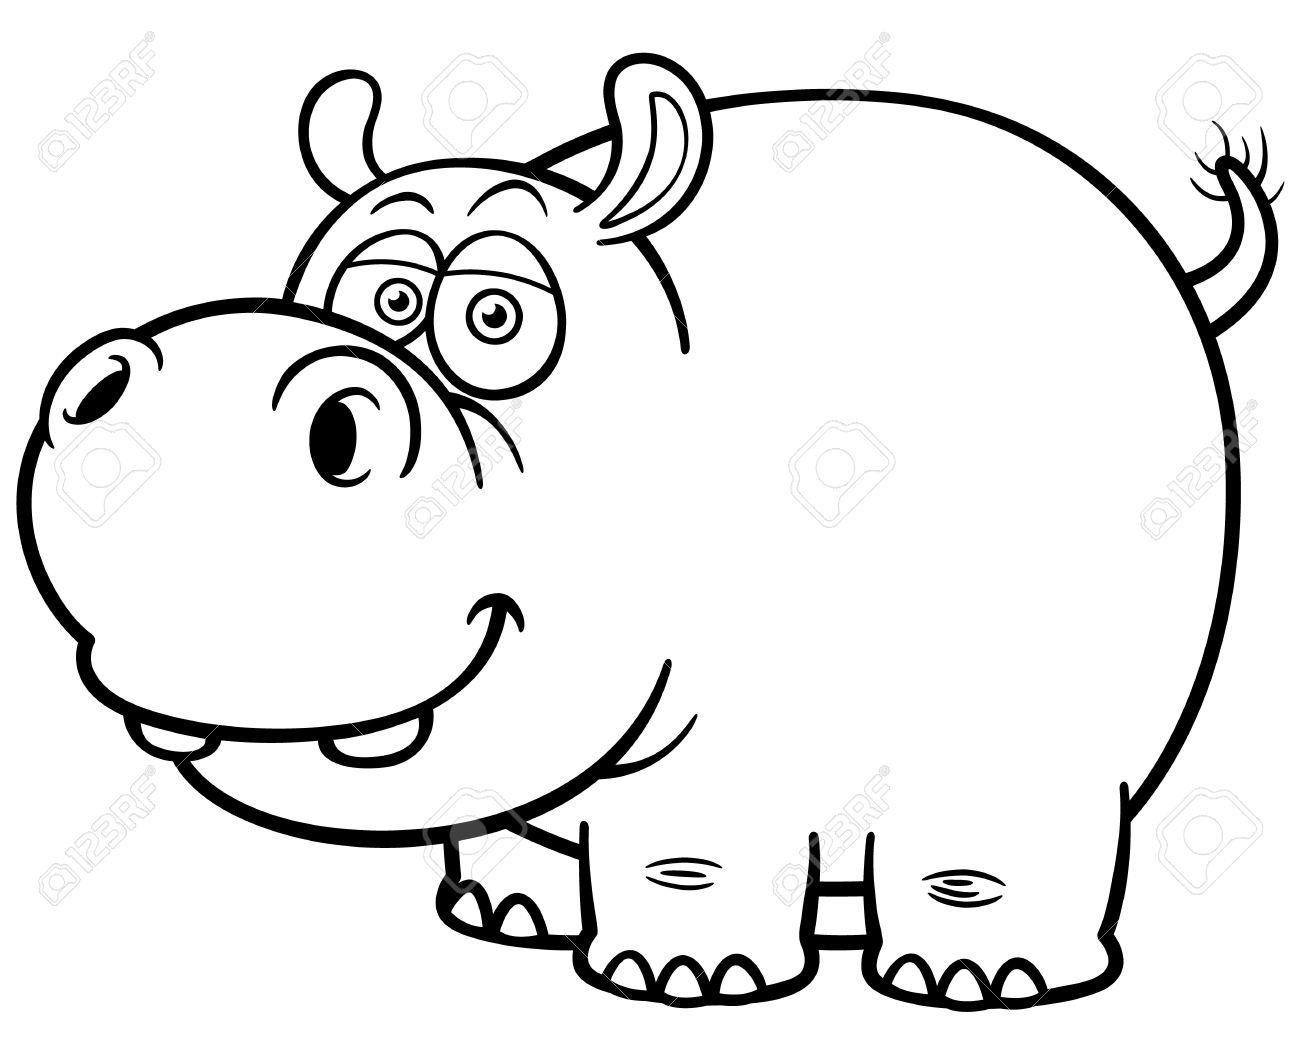 hight resolution of illustration of cartoon hippopotamus coloring book stock vector 28869786